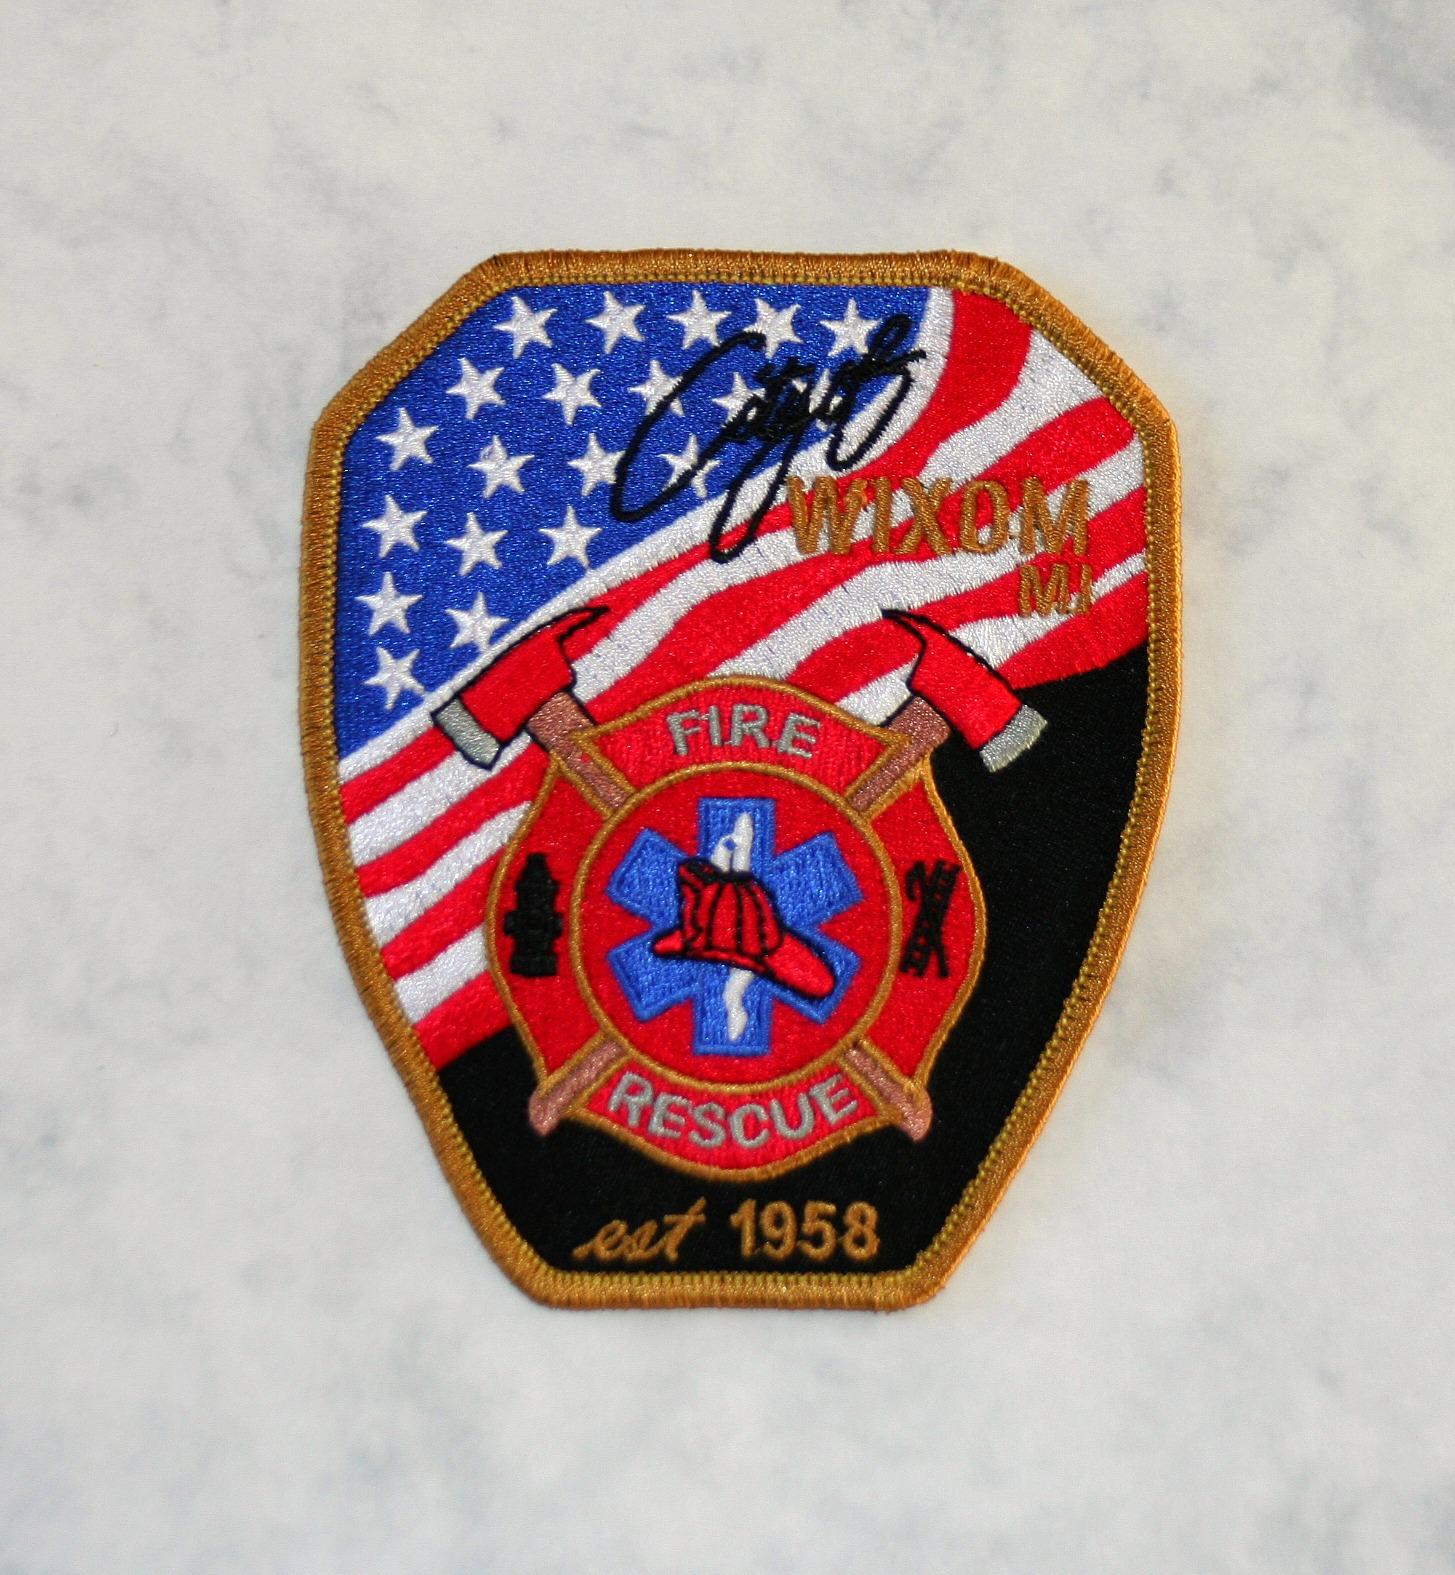 Wixom, Michigan Rescue